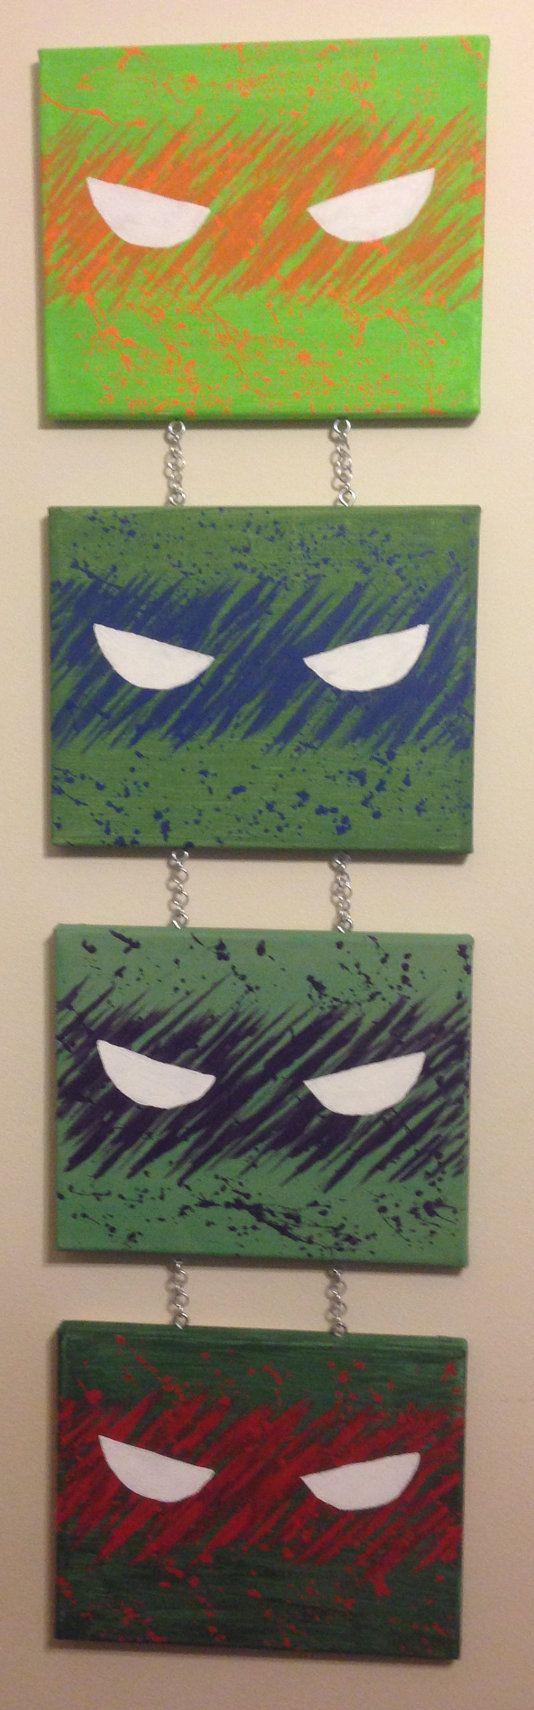 Teenage Mutant Ninja Turtles, Splatter Paint, TMNT, Michelangelo, Leonardo, Donatello, Raphael, Acrylic, Paint, Canvas